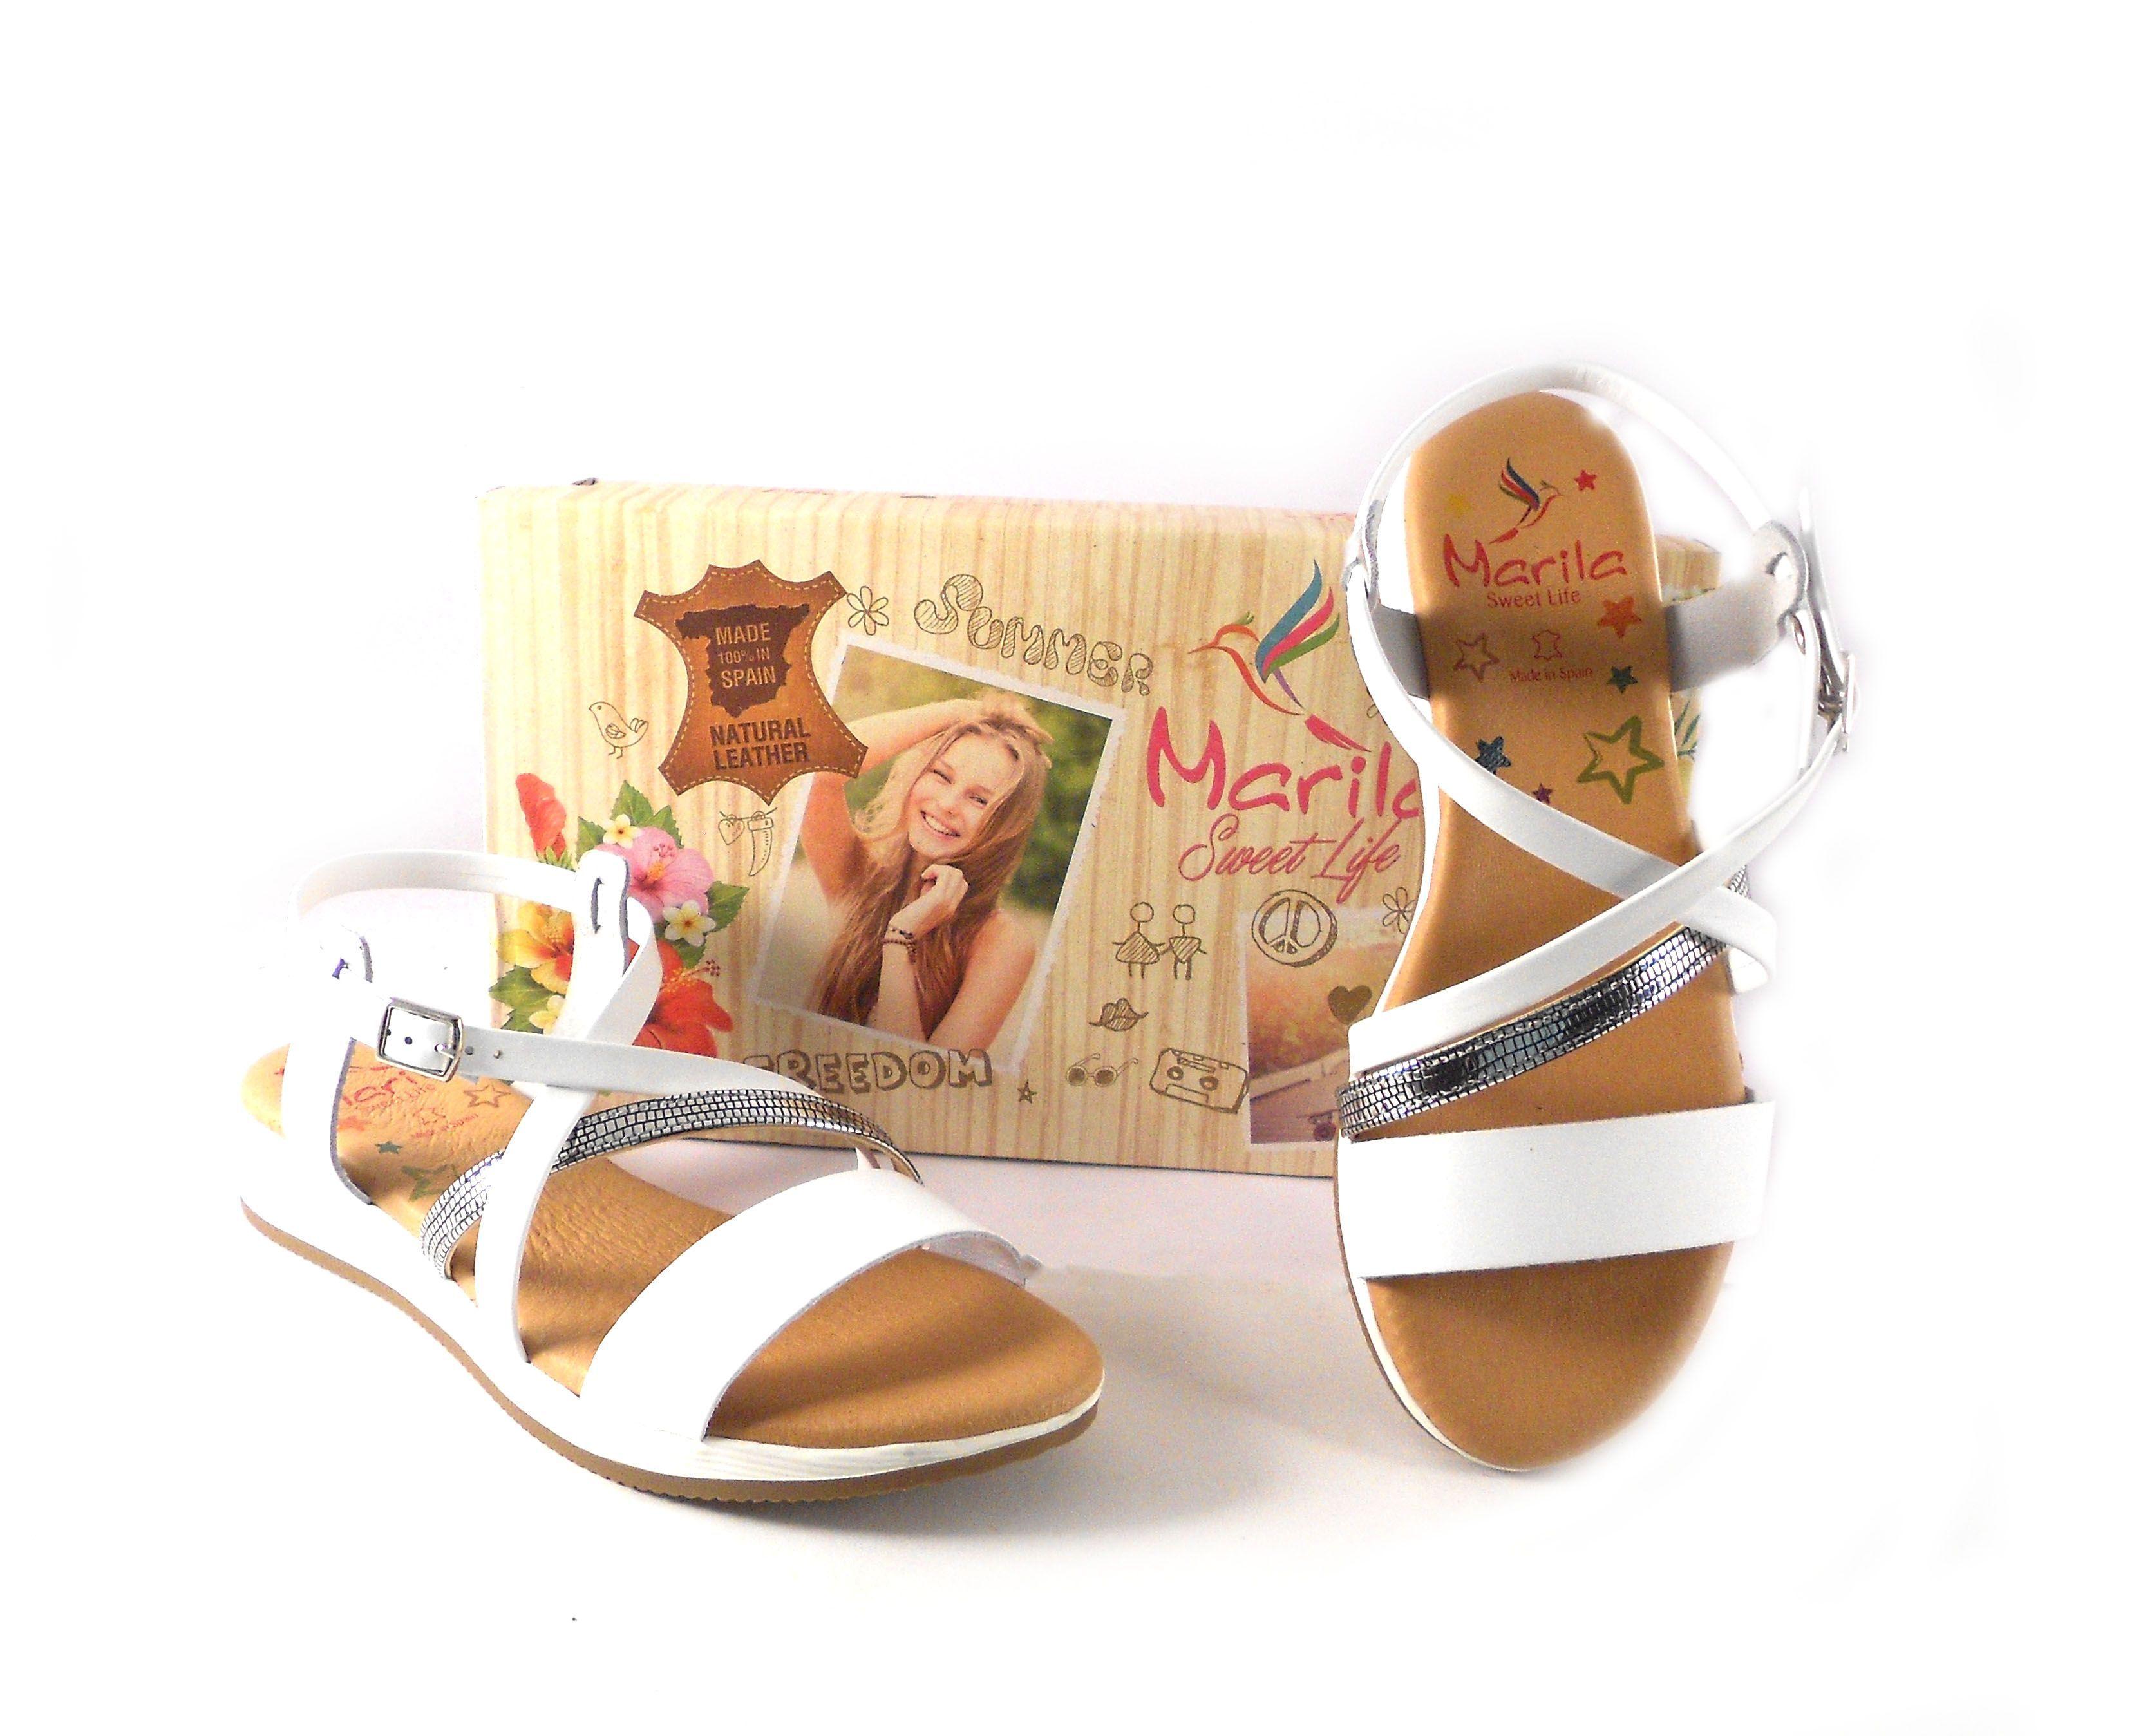 5664adcde11 Sandalias planas de tiras Marila Shoes blancas y plata